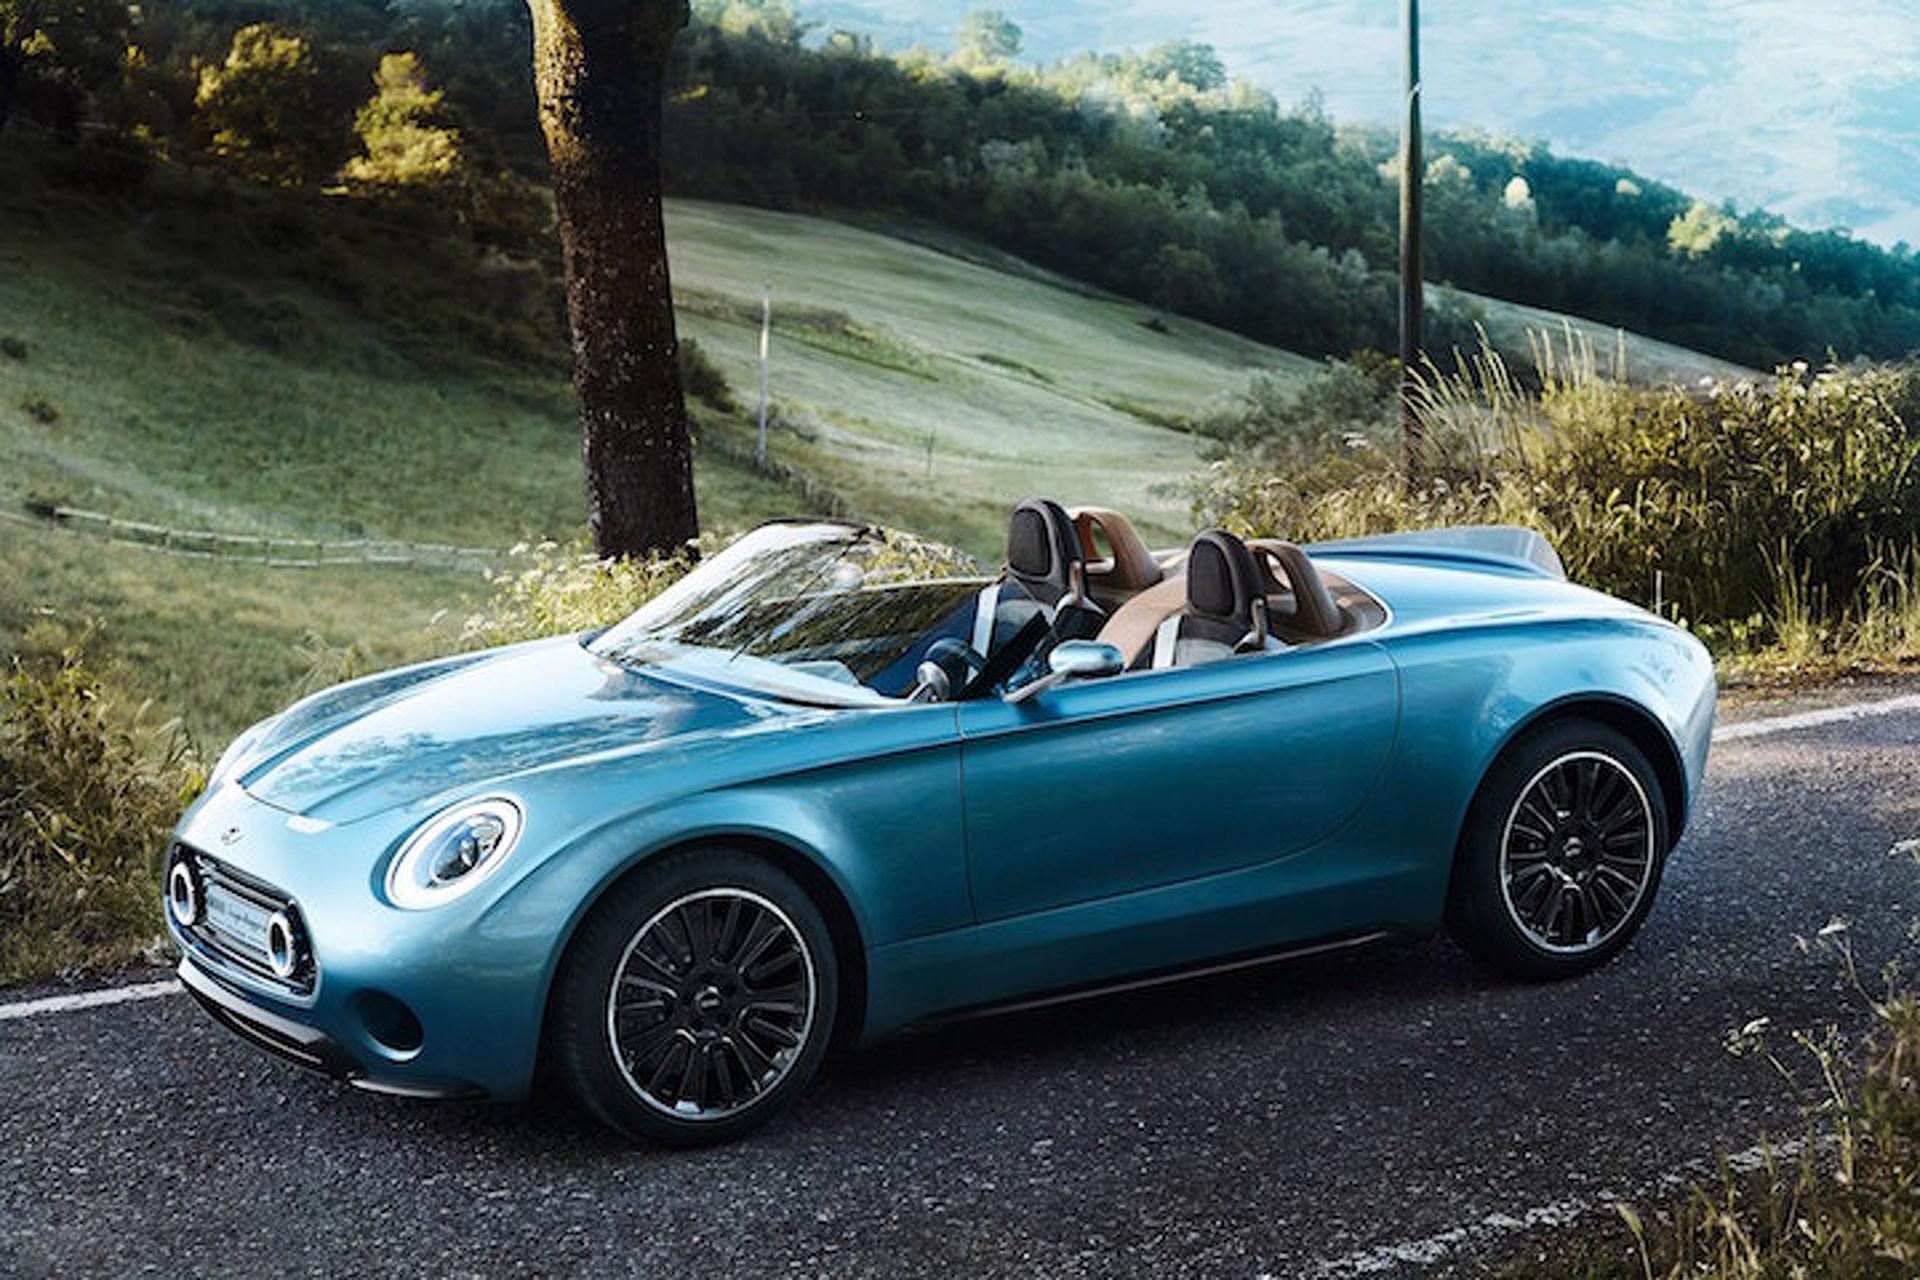 Mini Might Go More Mainstream With a New Sedan